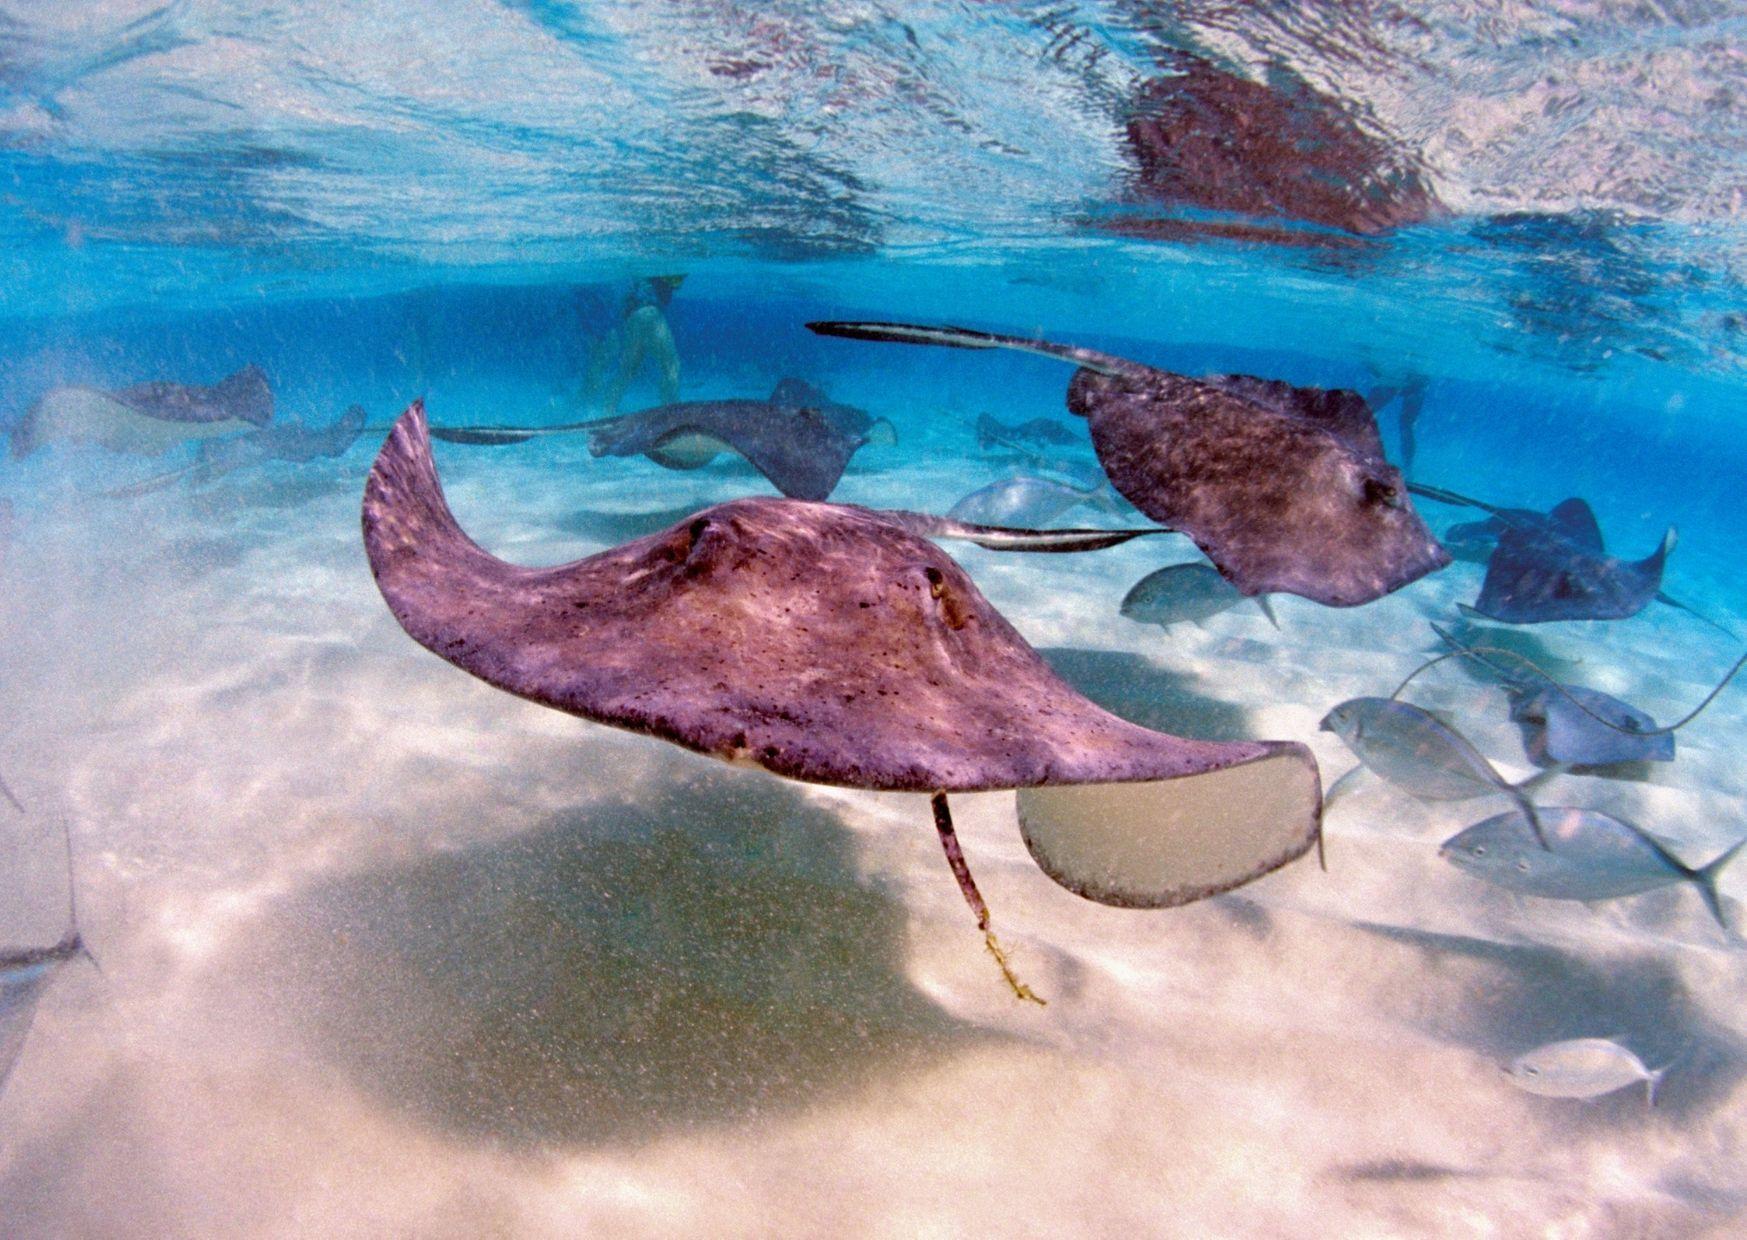 cayman Island stingray city